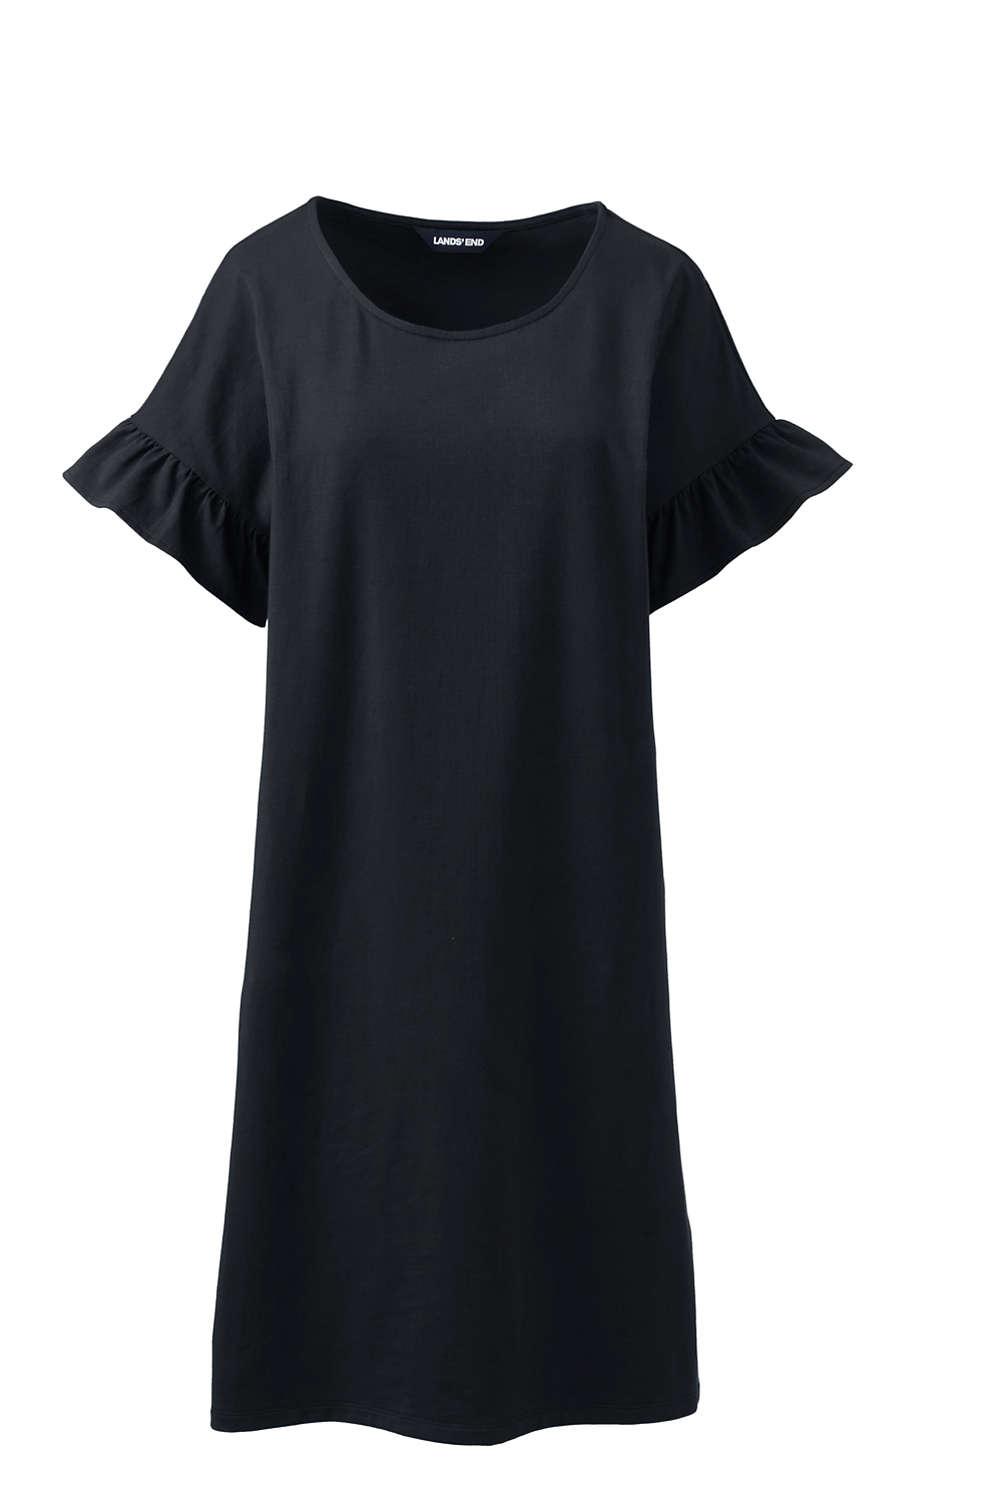 4c6388321f7 Women s Plus Size Short Sleeve Ruffle Knit Tee Shirt Dress from ...